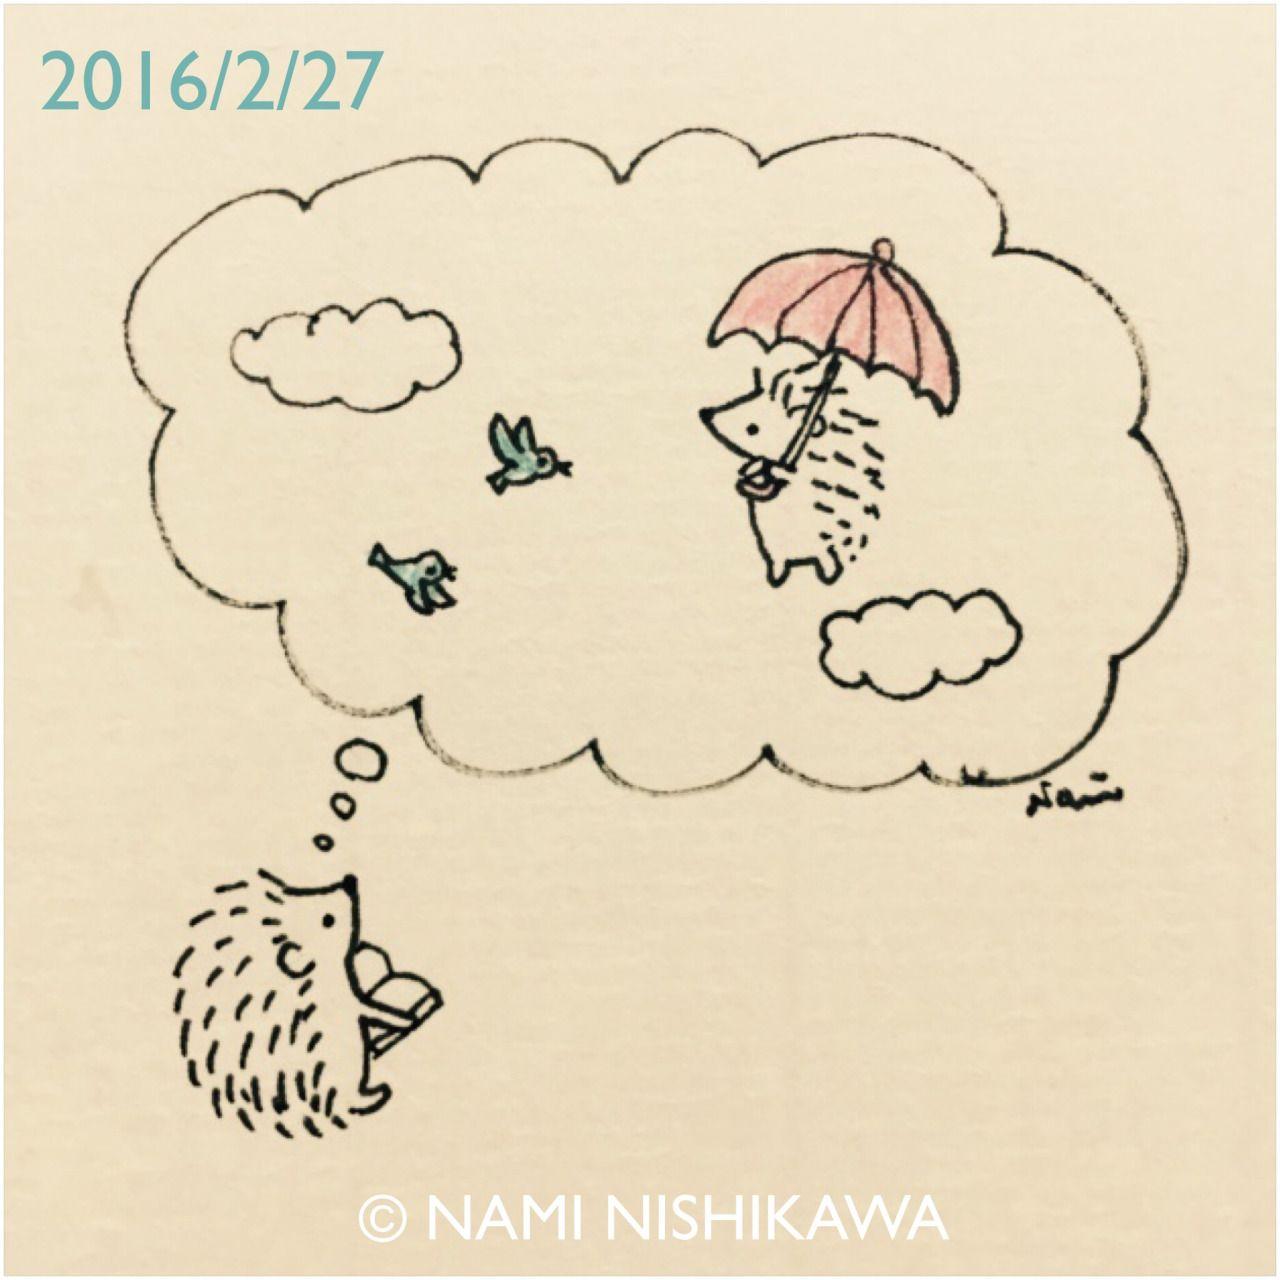 Pin von Zsuzsánna Onofer-Köteles auf Nishikawa   Pinterest   Igel ...